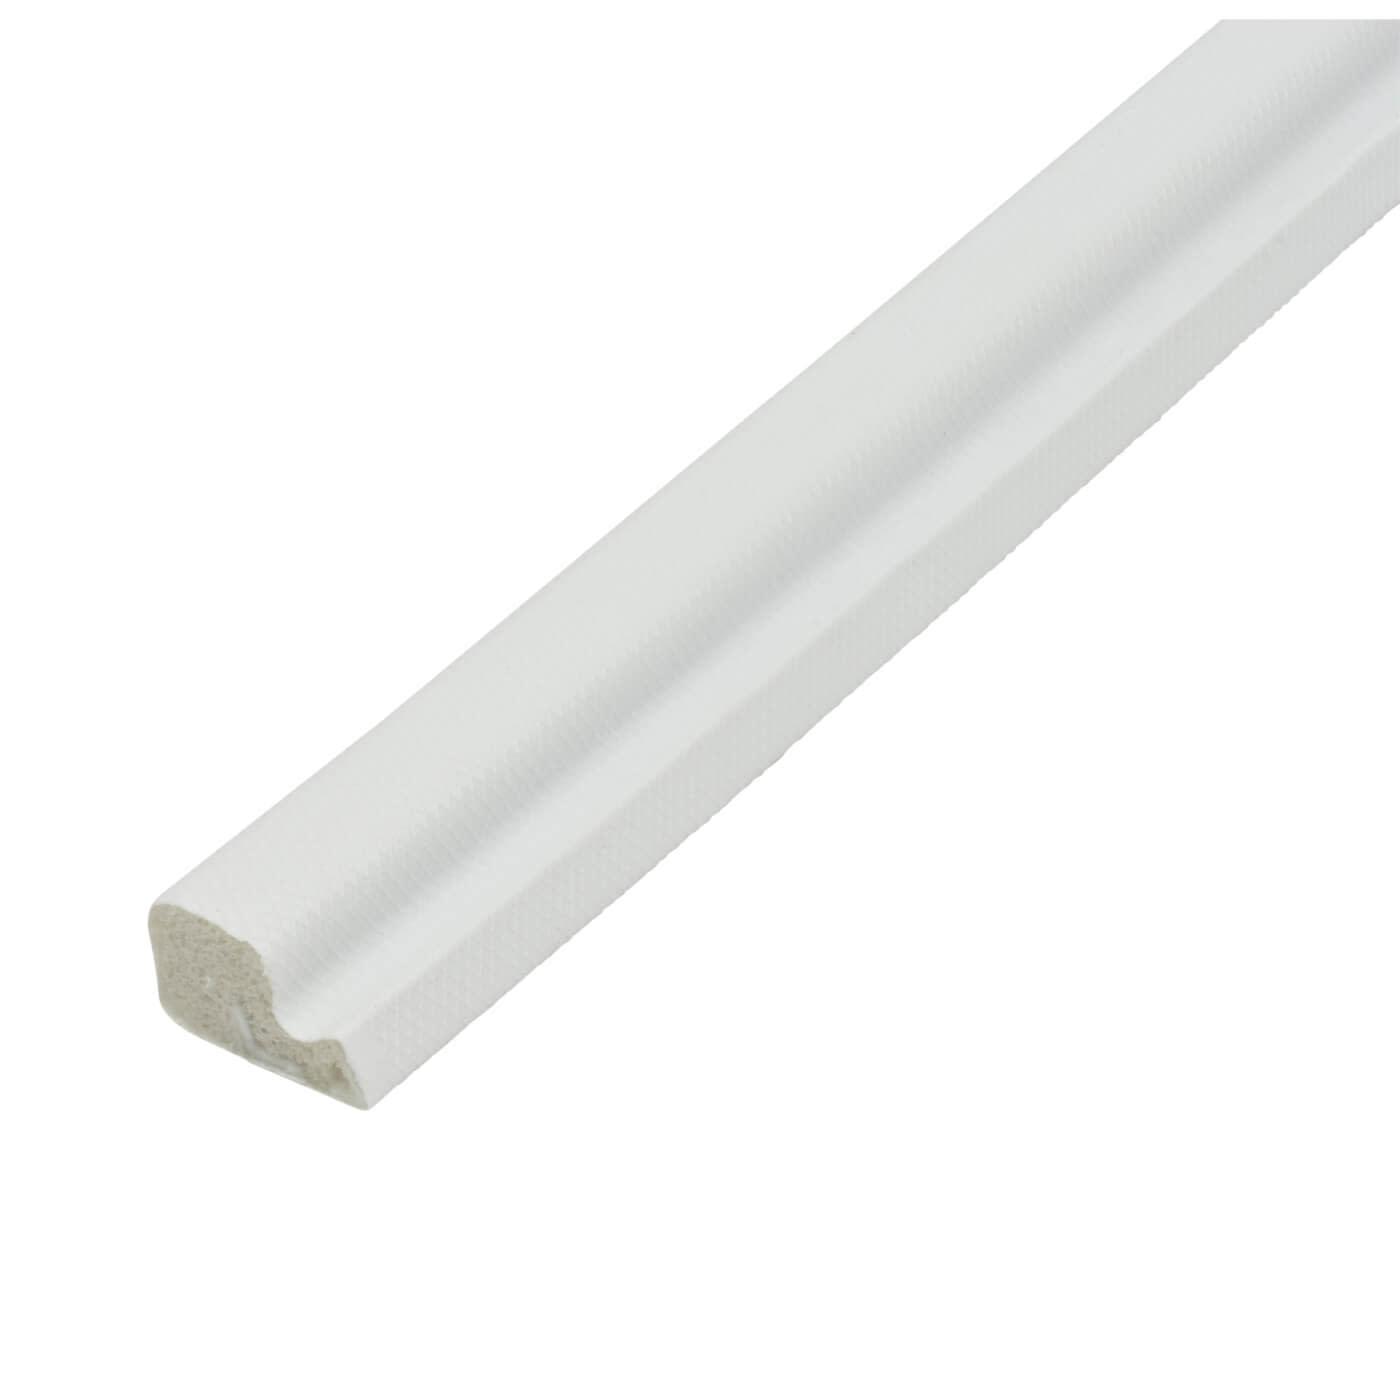 Schlegel AQ63 (QL3005) Aquamac Seal - 25 metres - White)